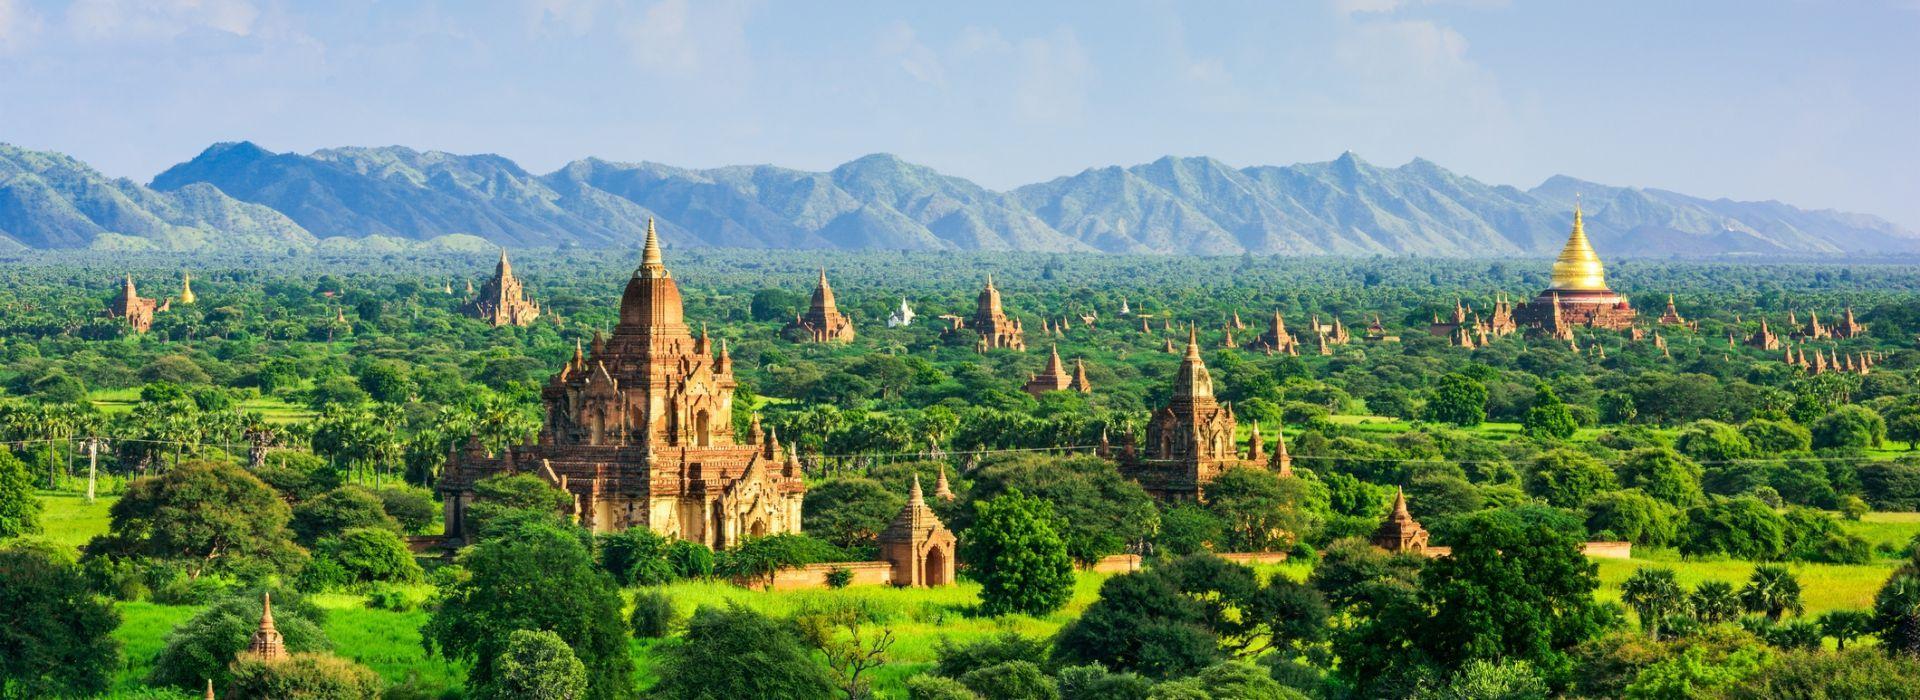 City sightseeing Tours in Bagan